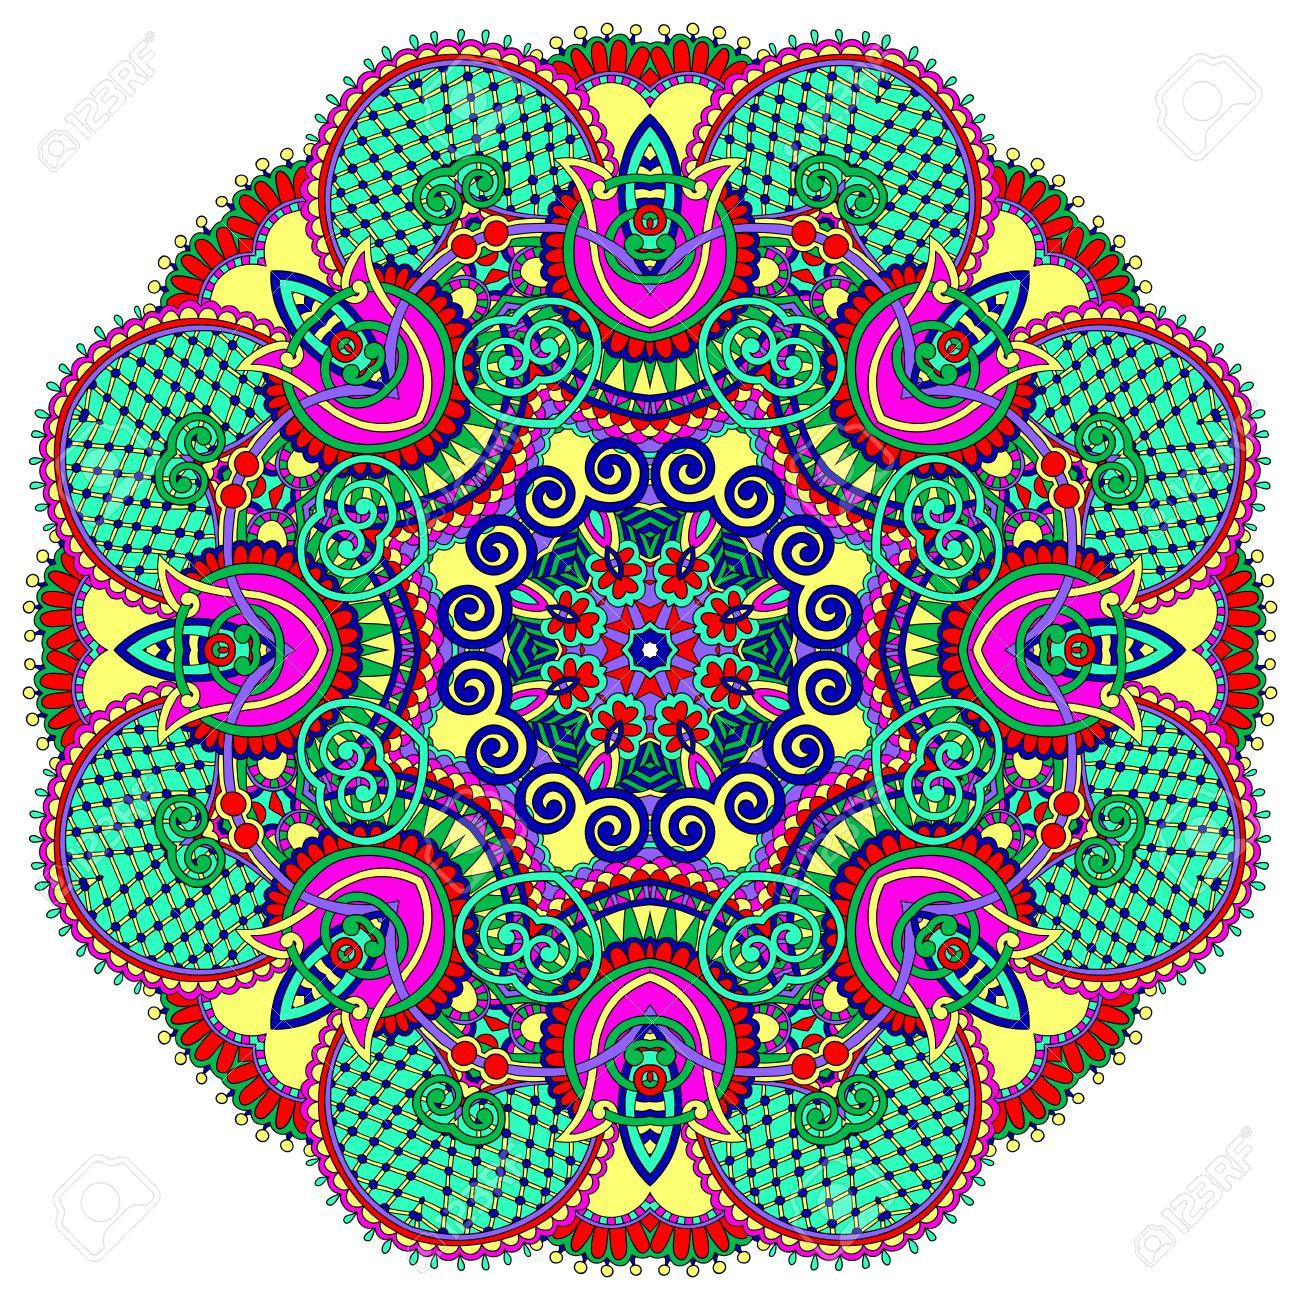 Mandala circle decorative spiritual indian symbol of lotus flower mandala circle decorative spiritual indian symbol of lotus flower round ornament pattern vector mightylinksfo